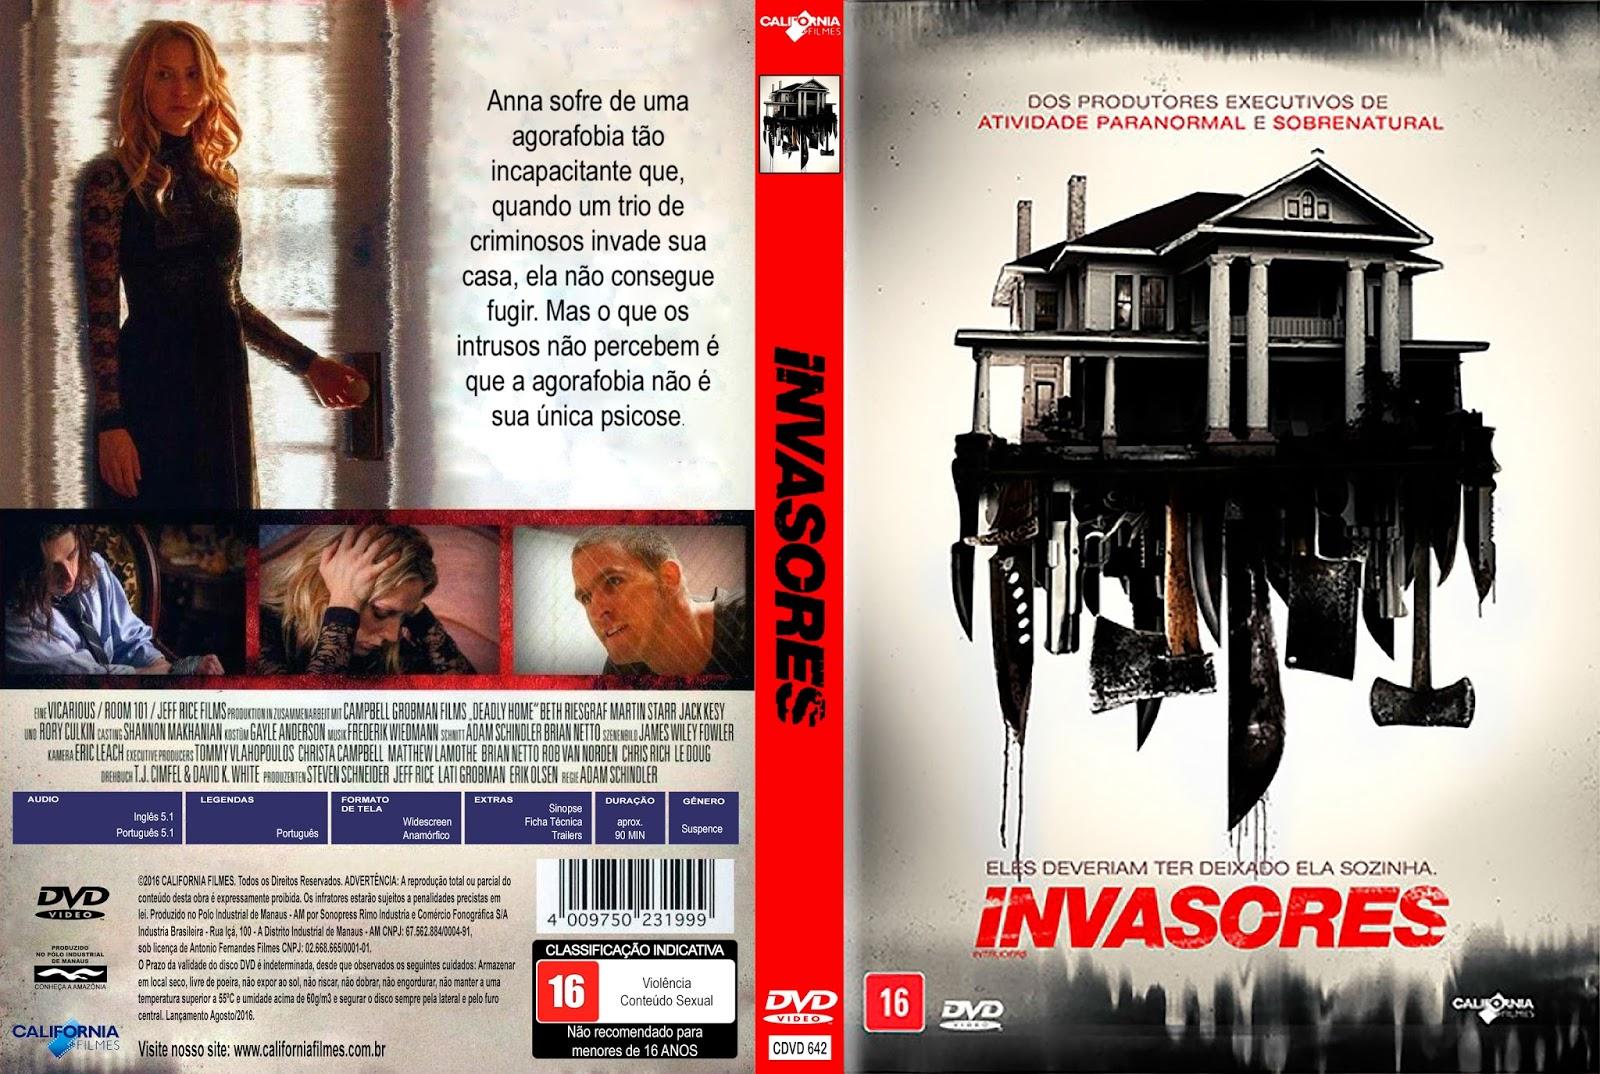 Download Invasores DVD-R Invasores 2B  2BCapa 2BFilme 2BDVD